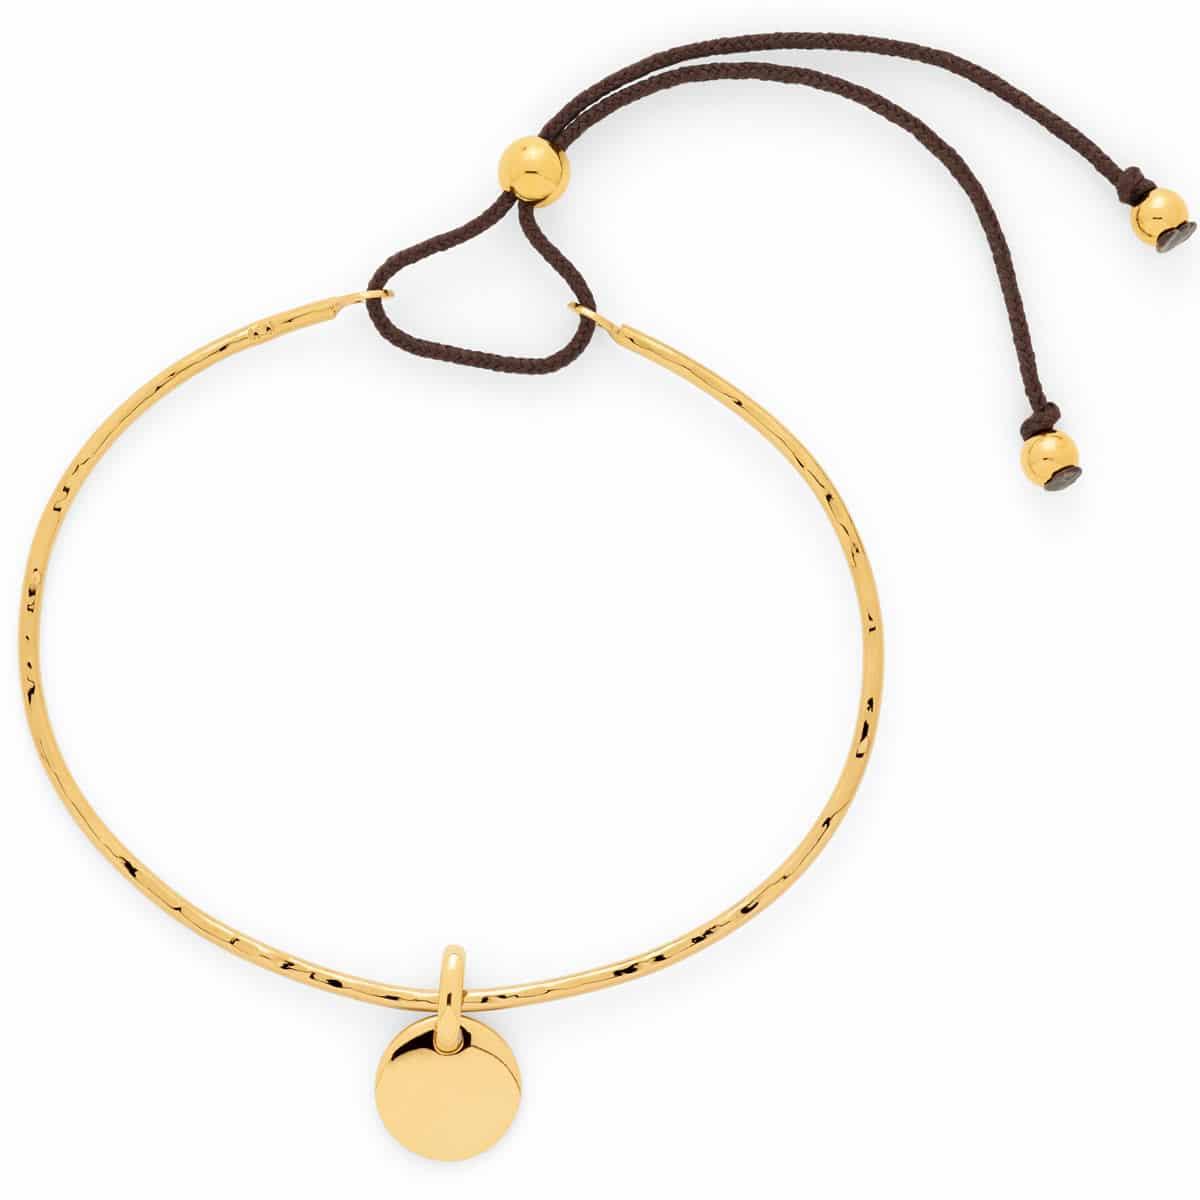 Bracelet jonc fin mini breloque Atelier de Famille